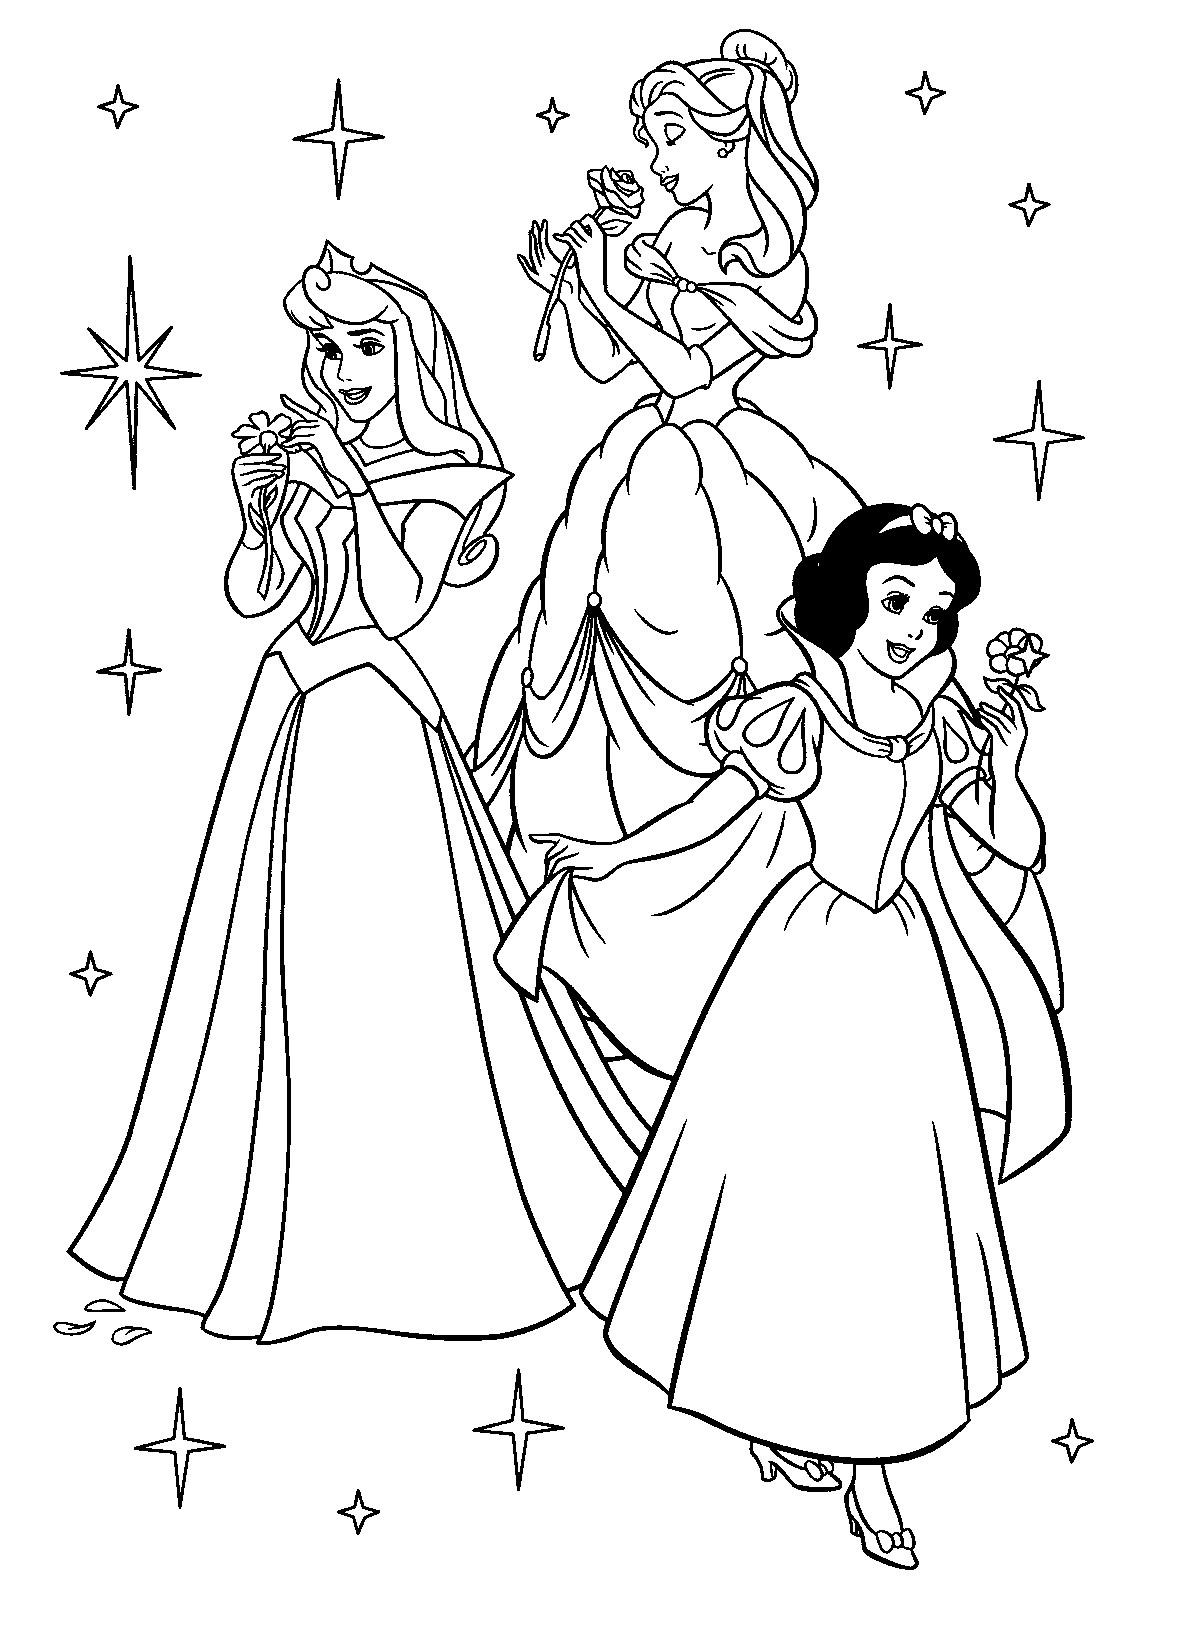 Princess Coloring Book  Free Printable Disney Princess Coloring Pages For Kids